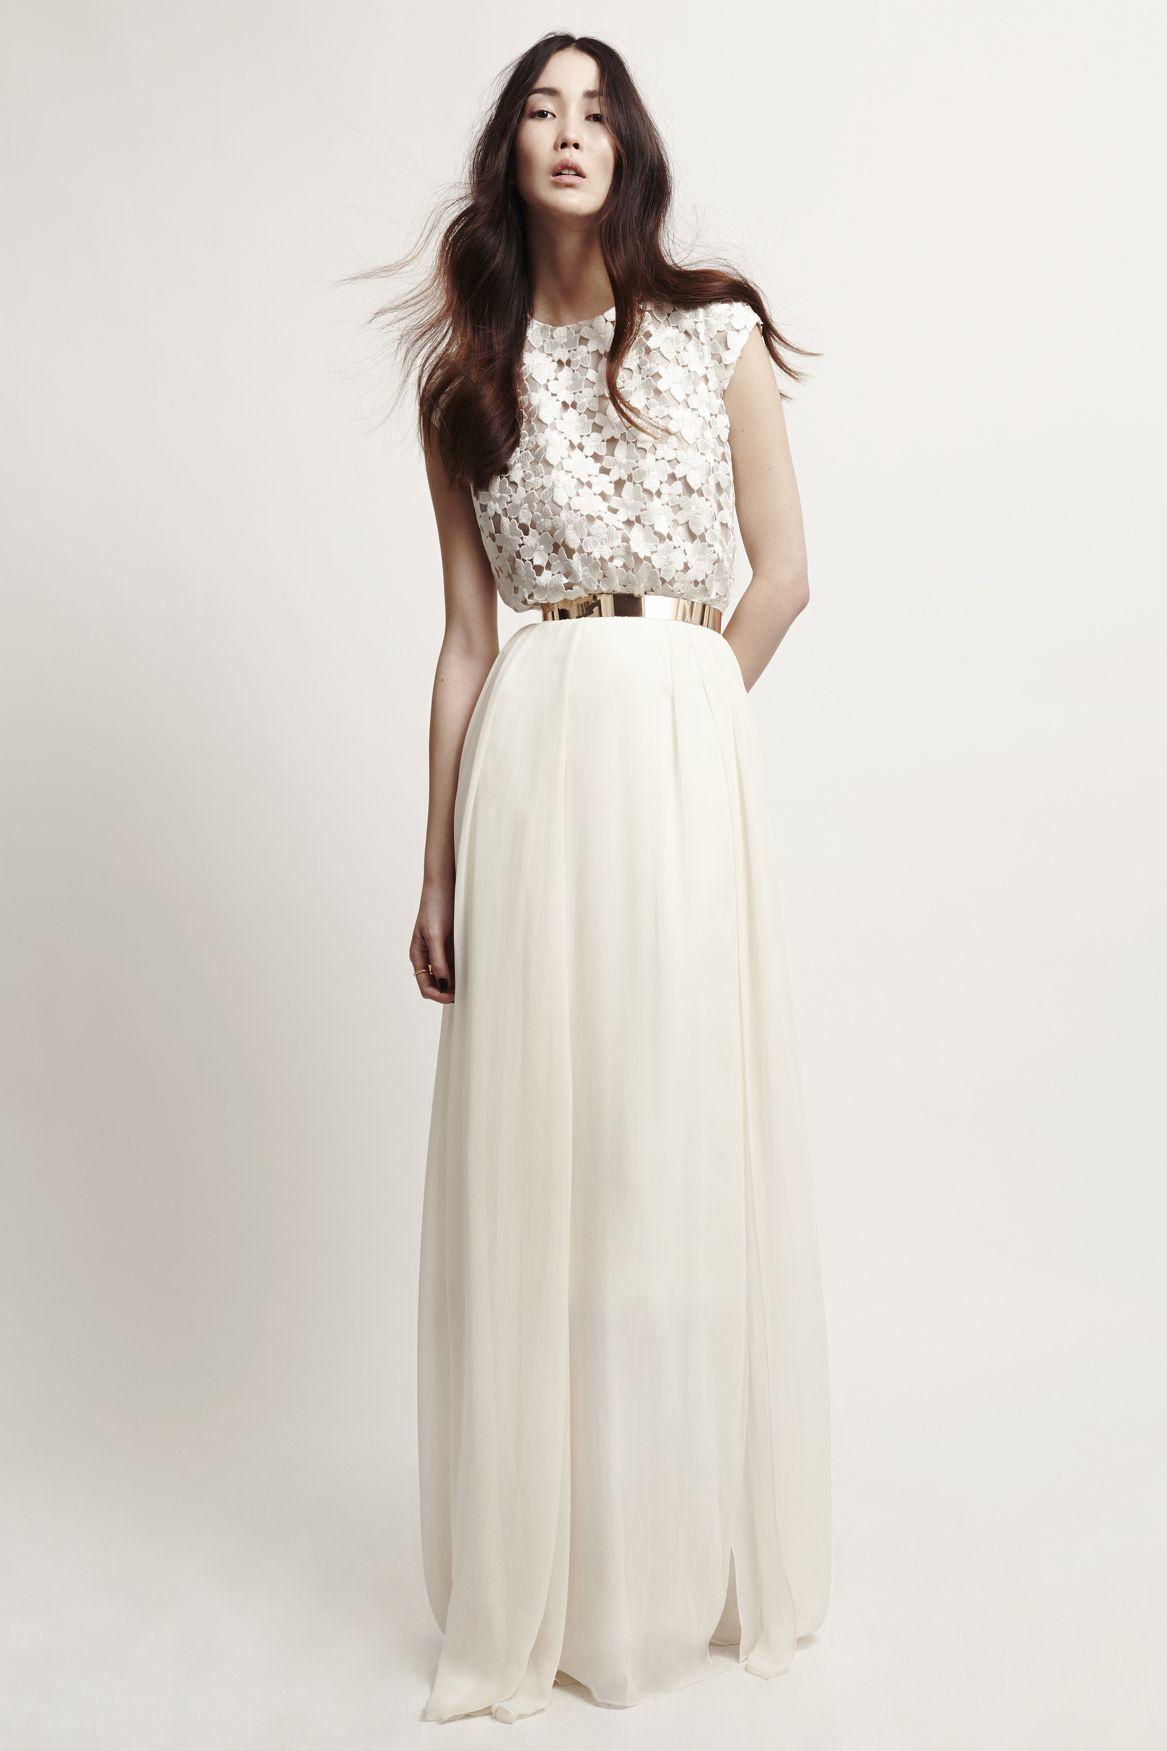 Belle Michelle Dress, Kaviar Gauche: Belle Michelle Dress